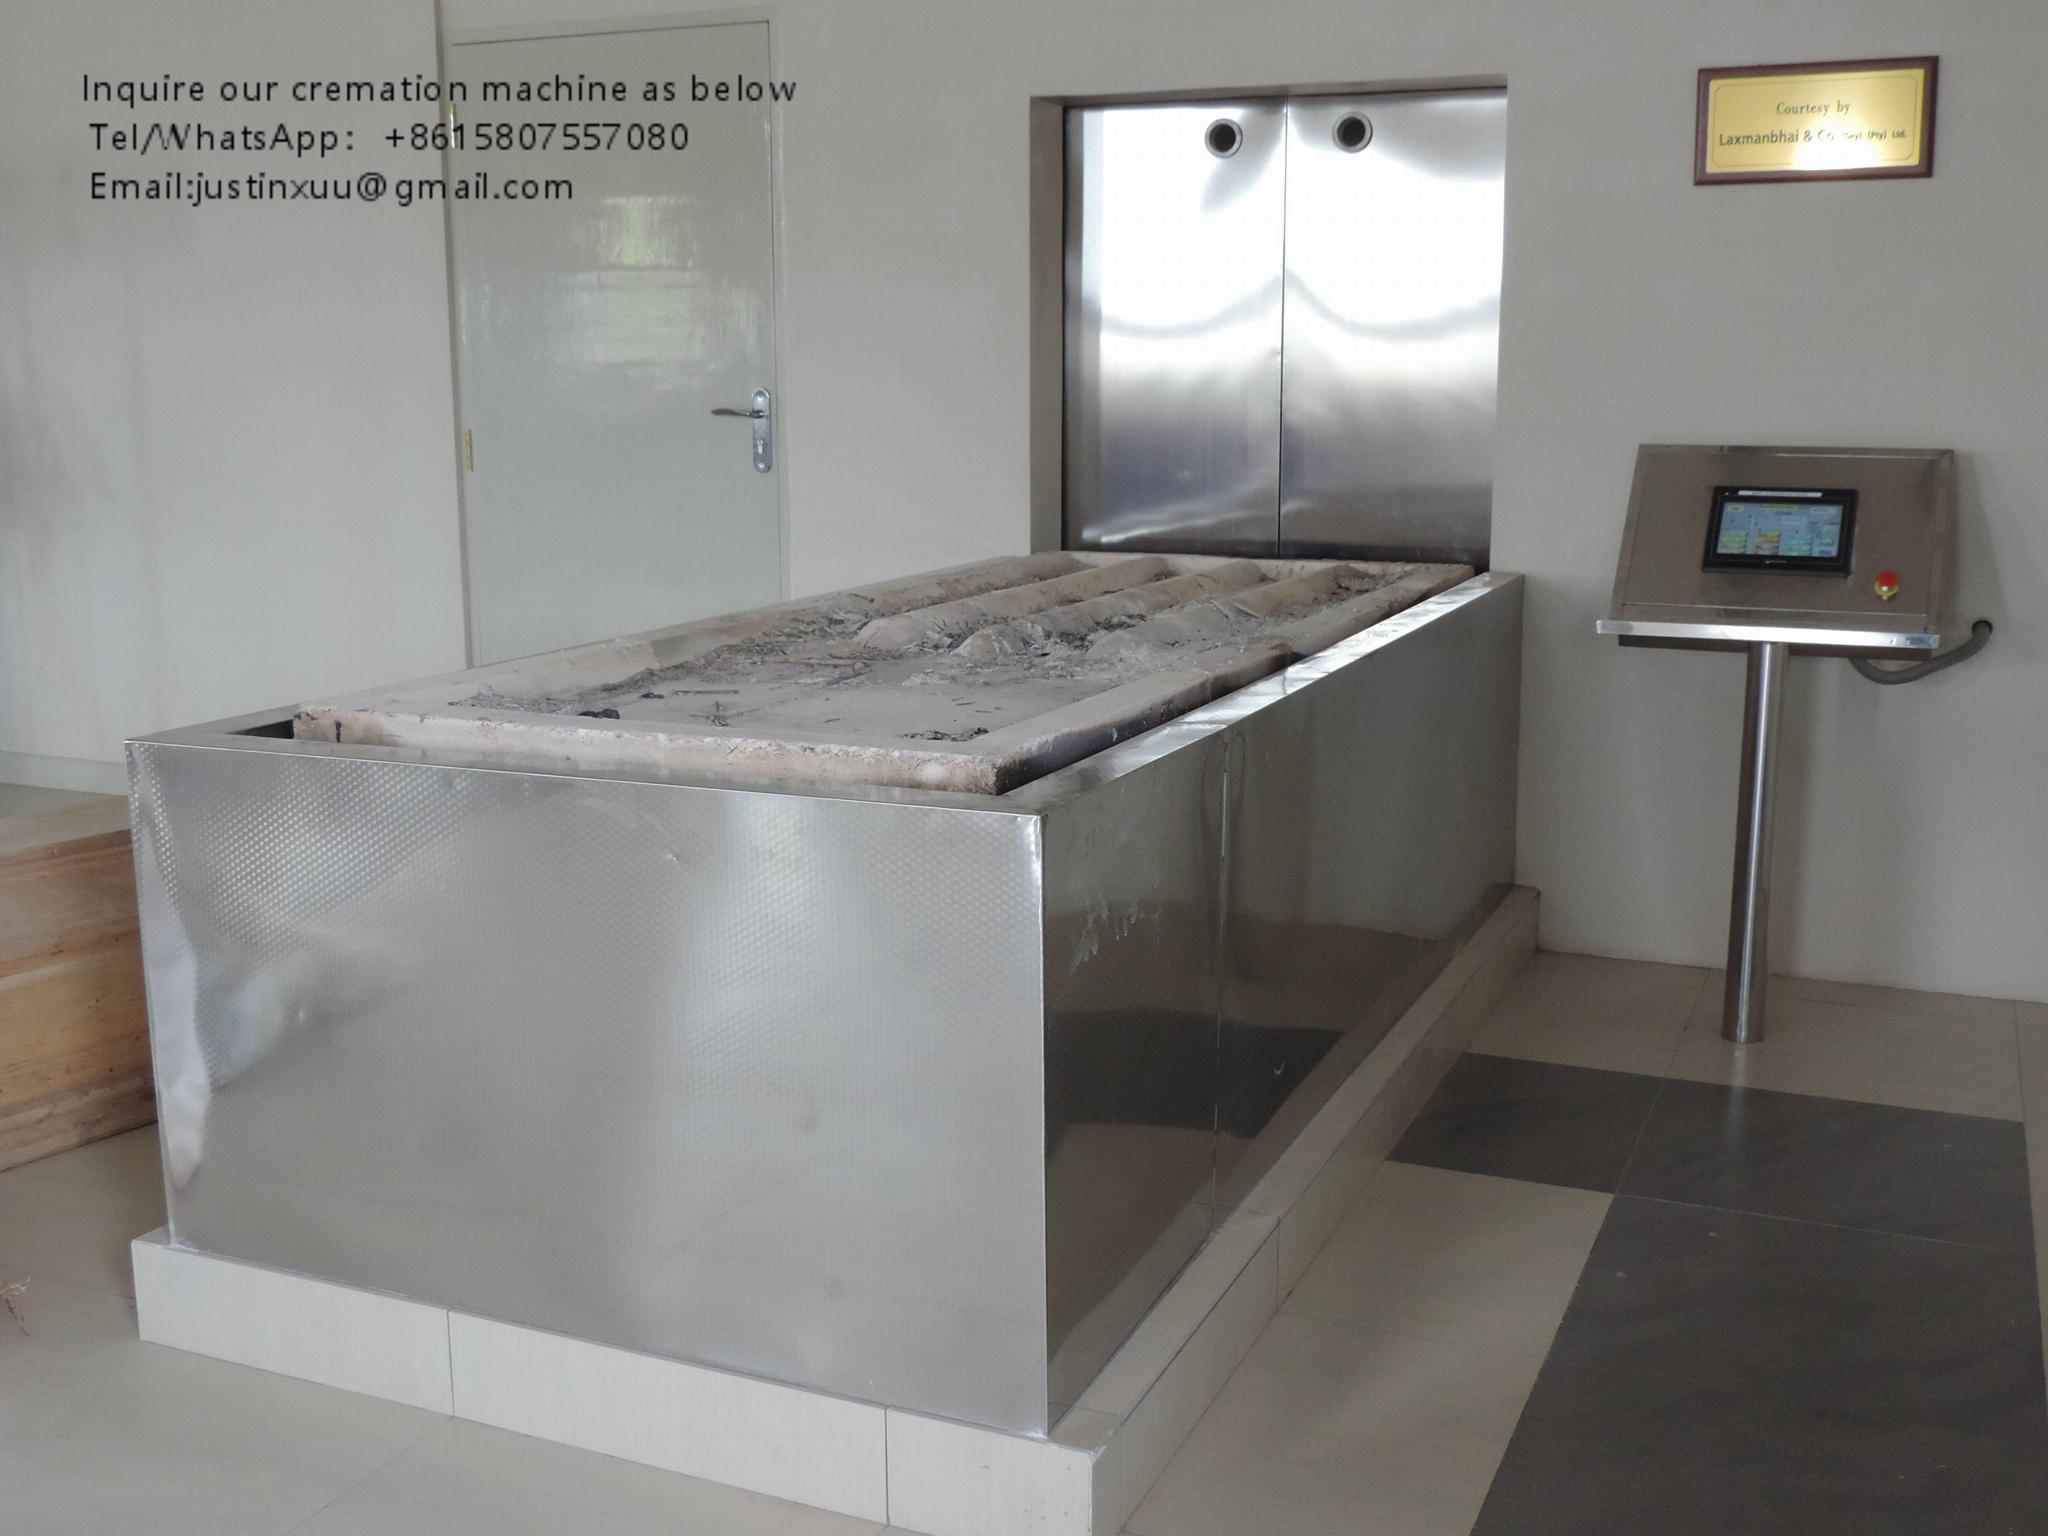 sell human crematorium portable machine equipment fast buring crematory 10